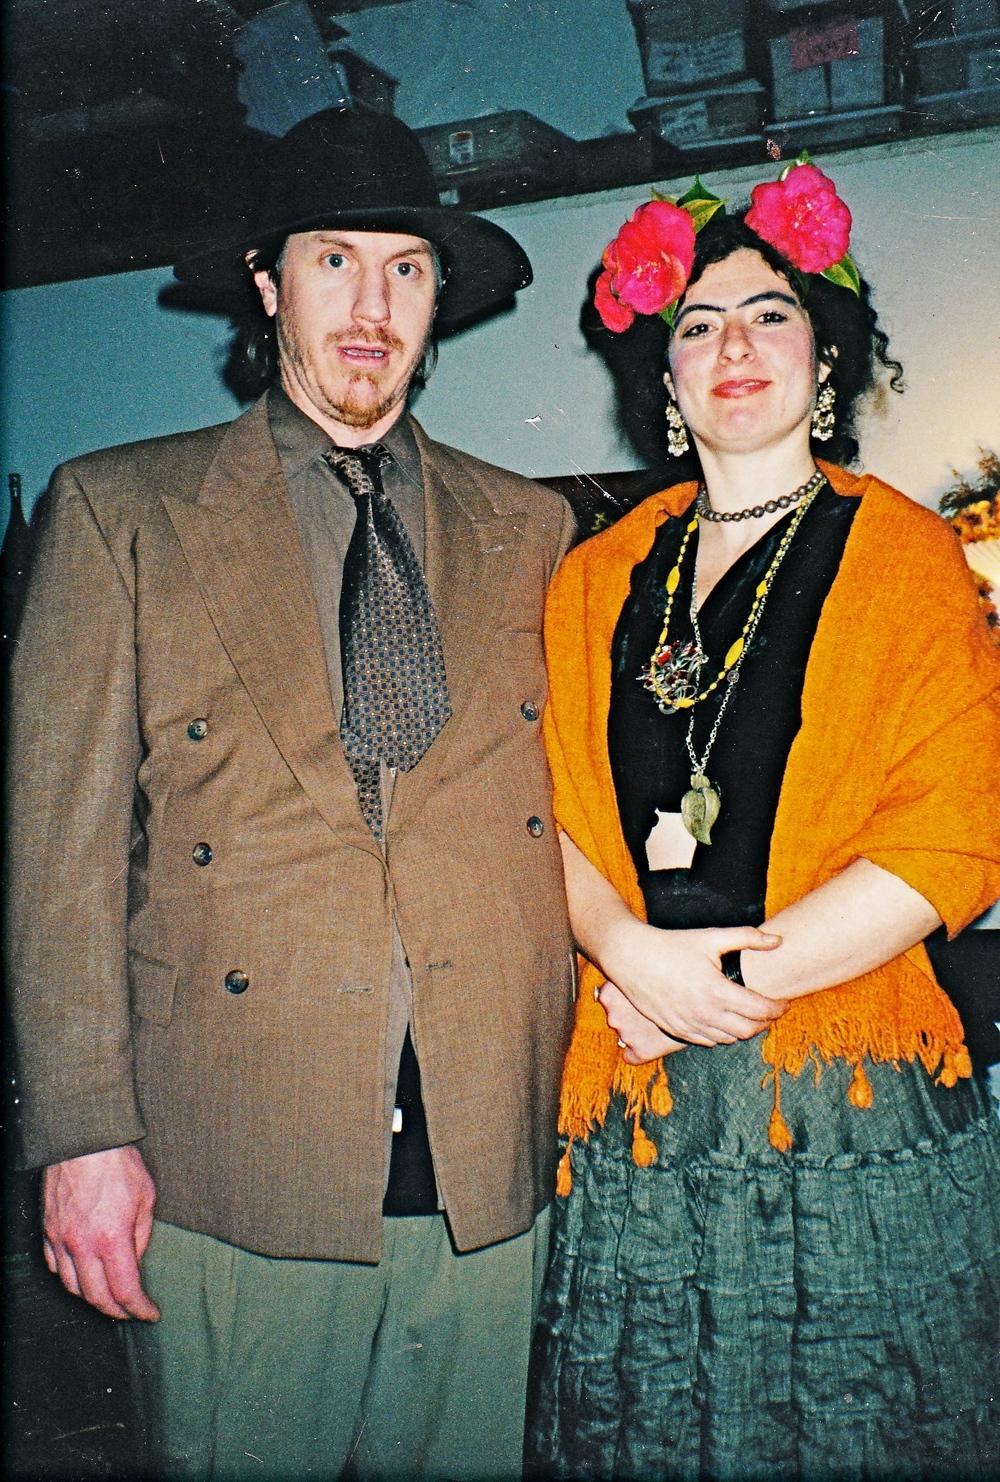 Tennyson with Freda, maybe 2009